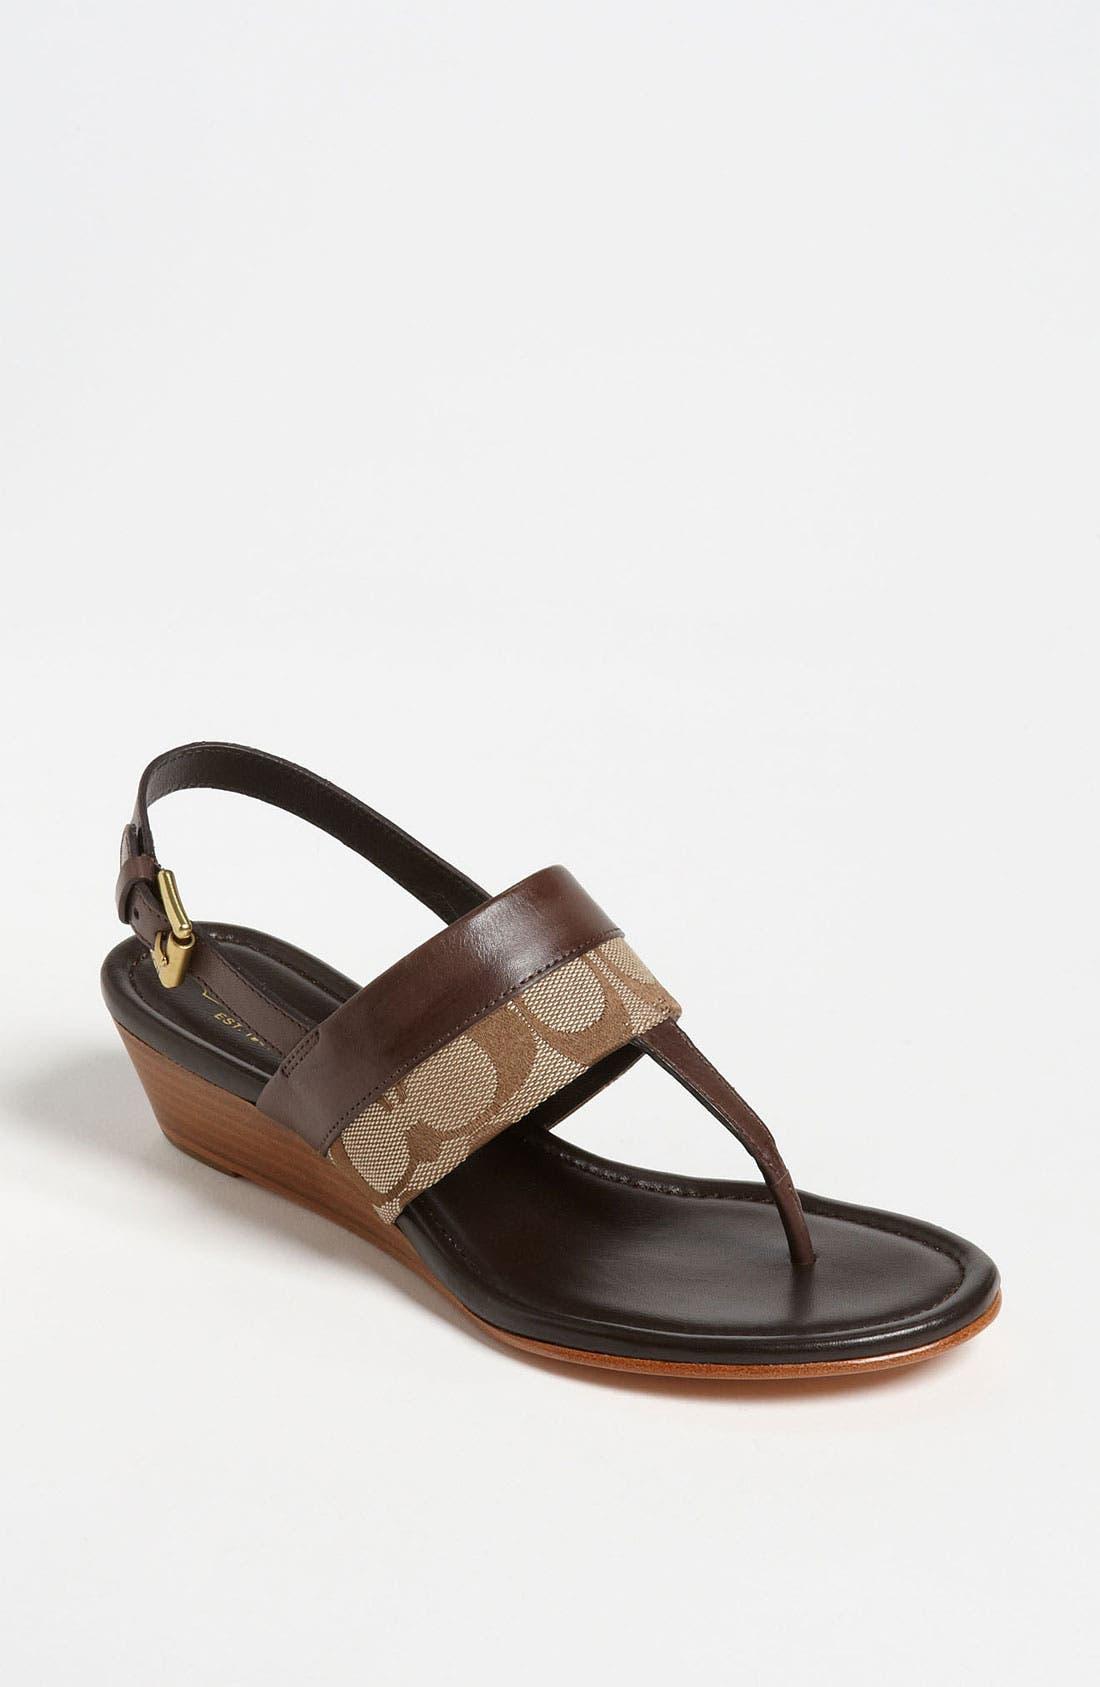 Main Image - COACH 'Violett' Sandal